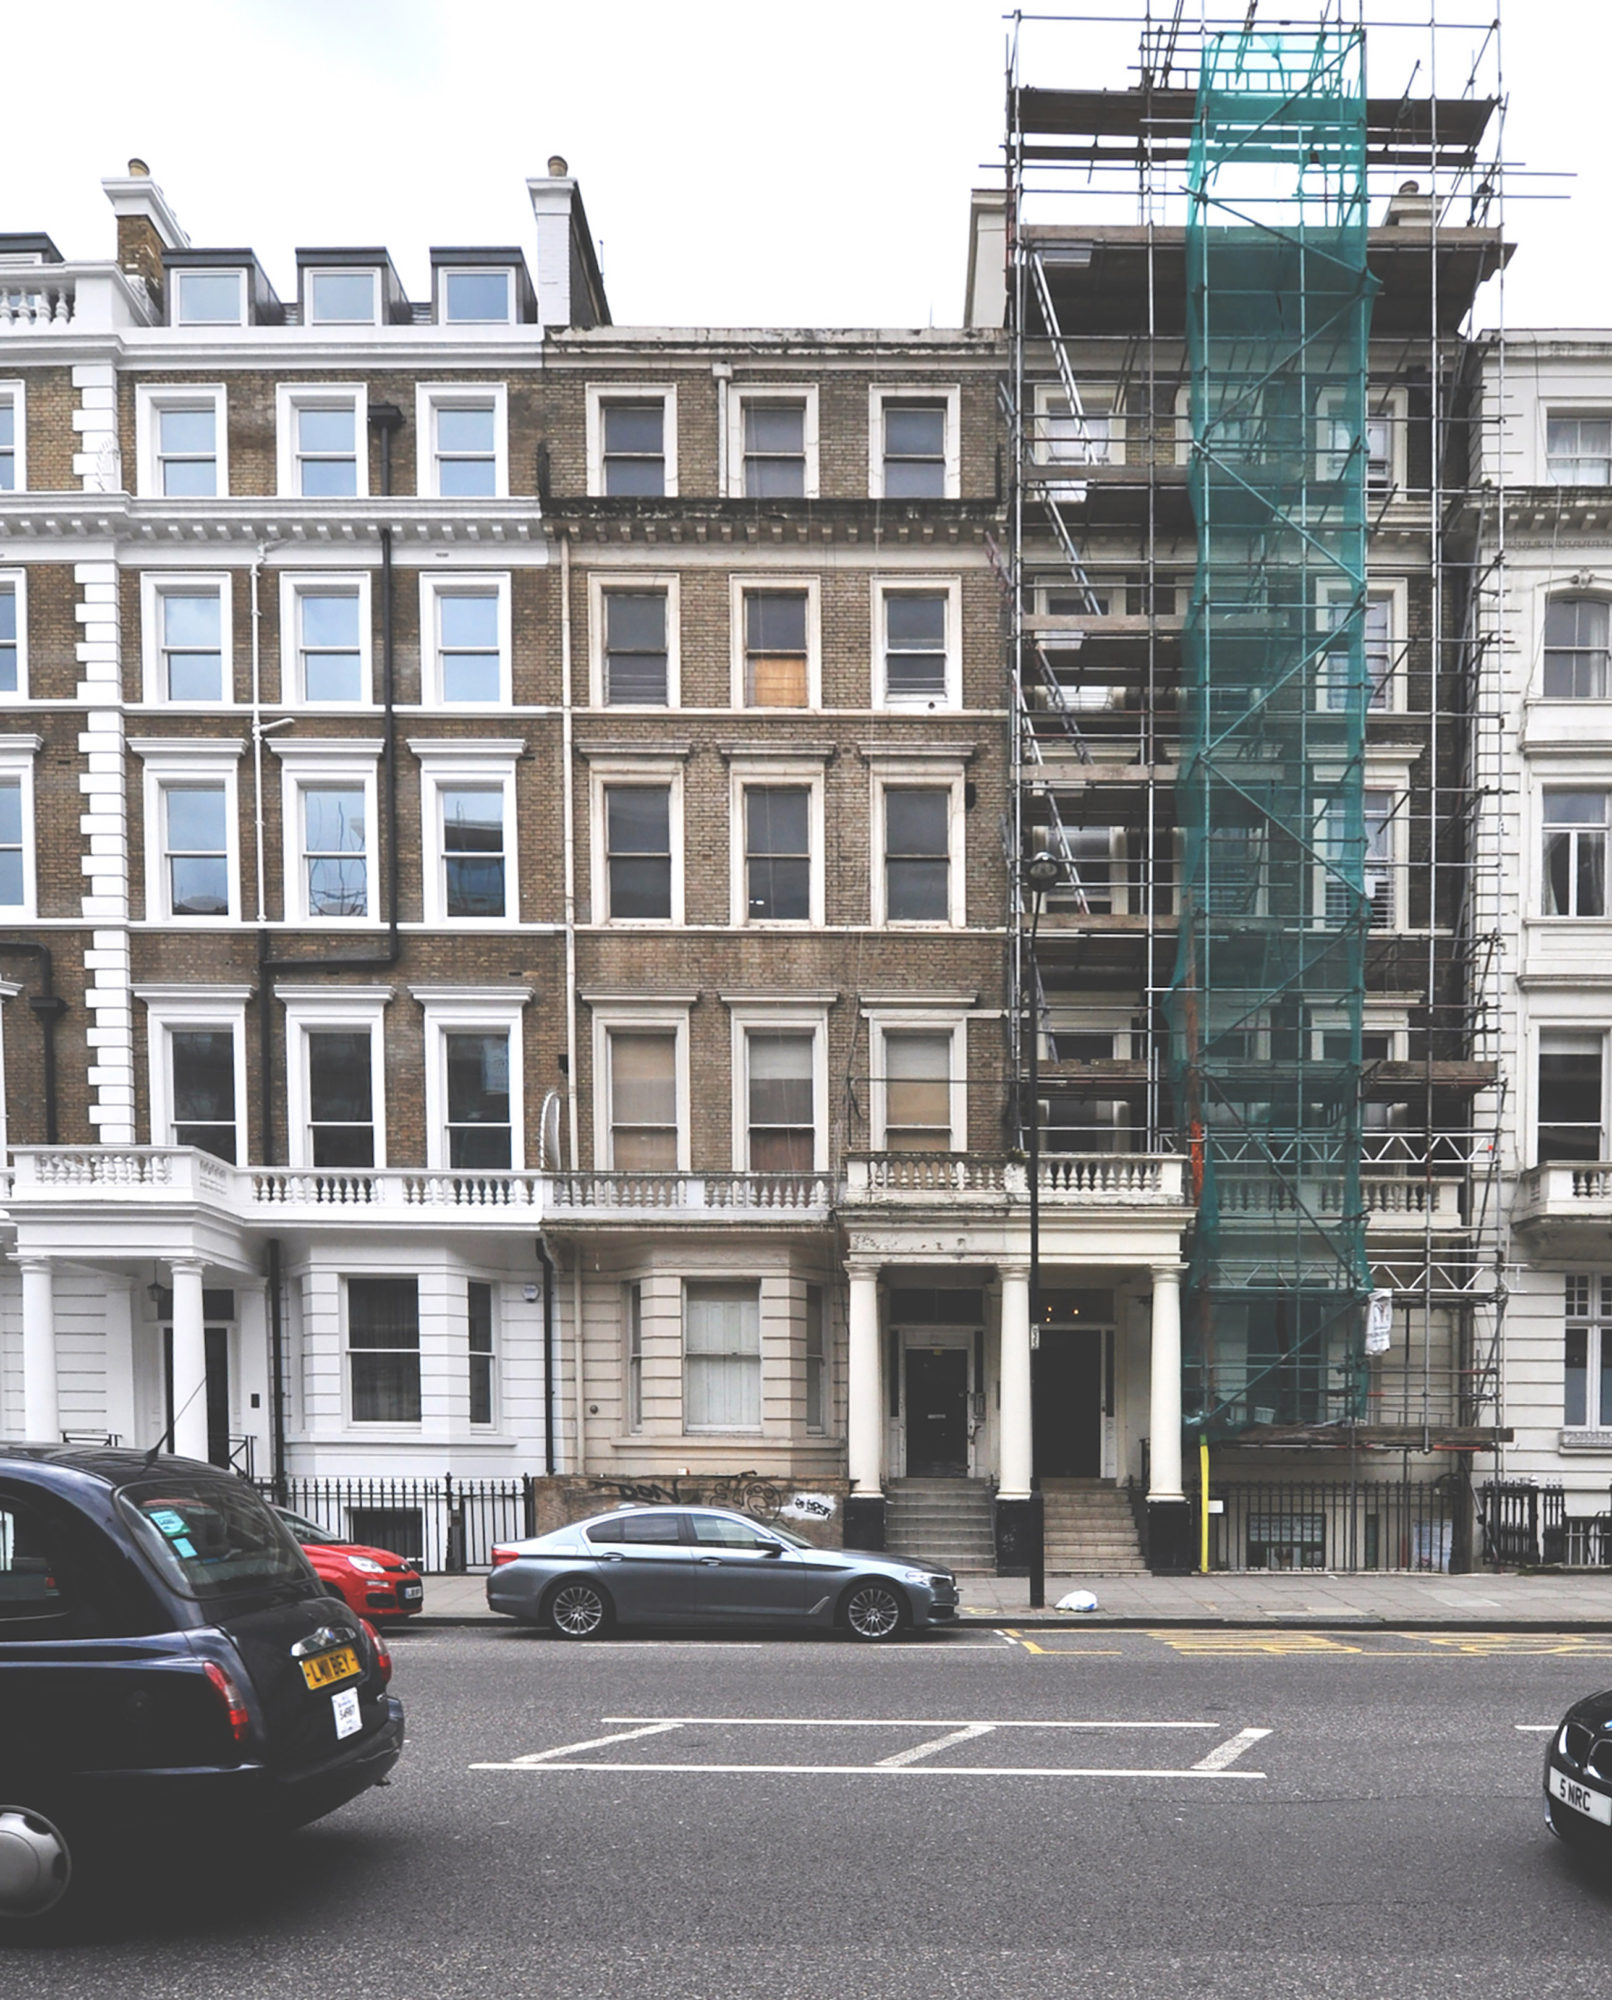 HONE: Architecture & Design